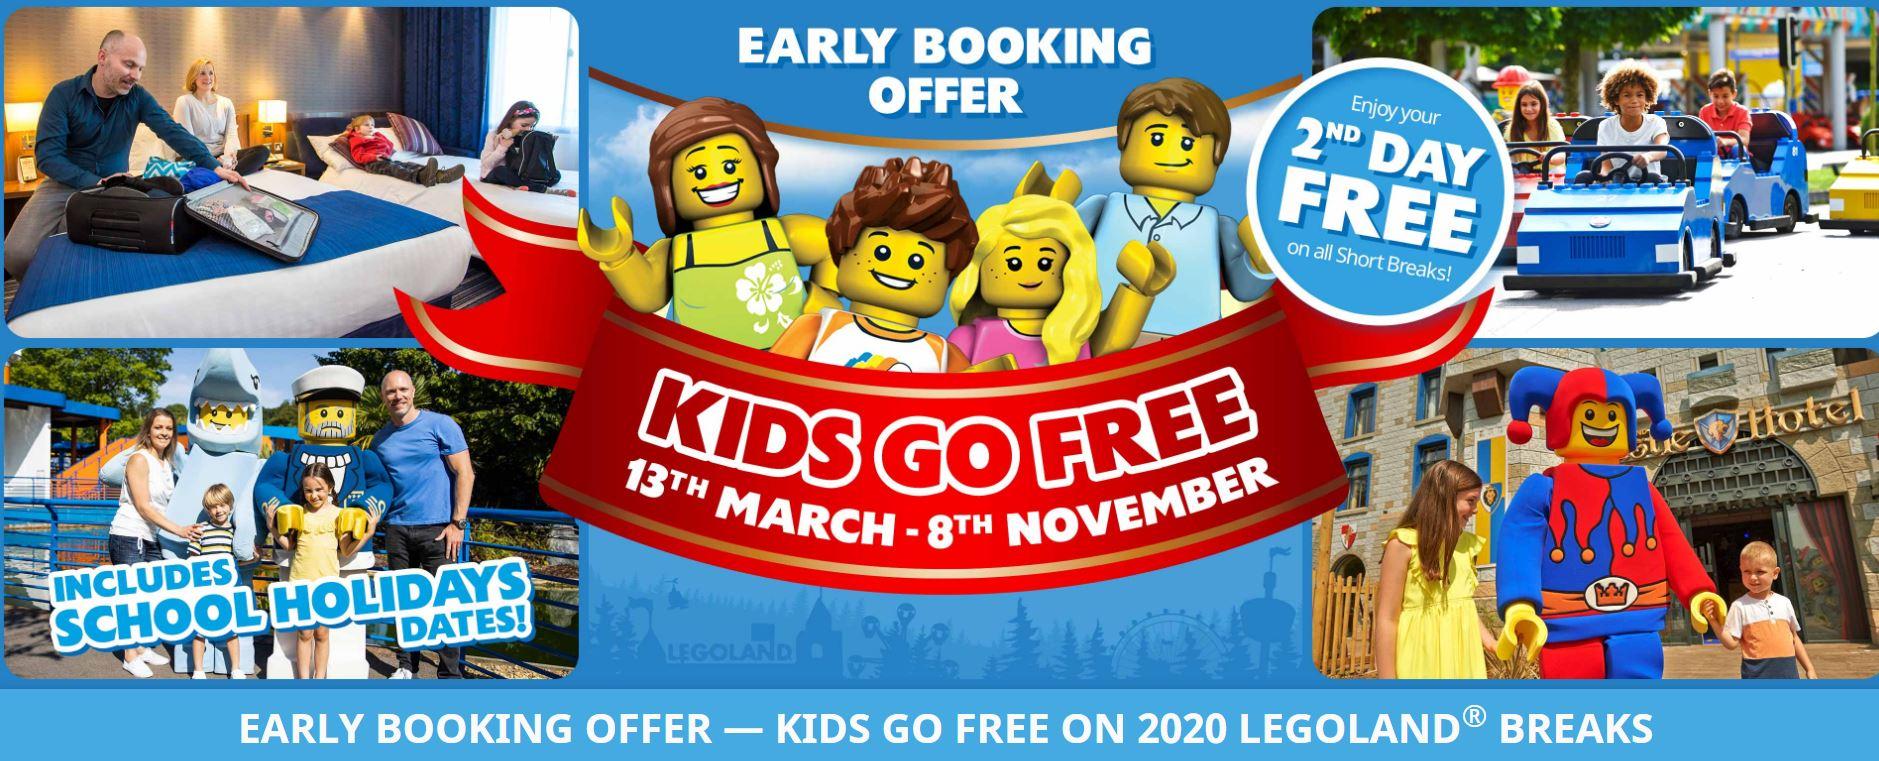 Kids go free 2020